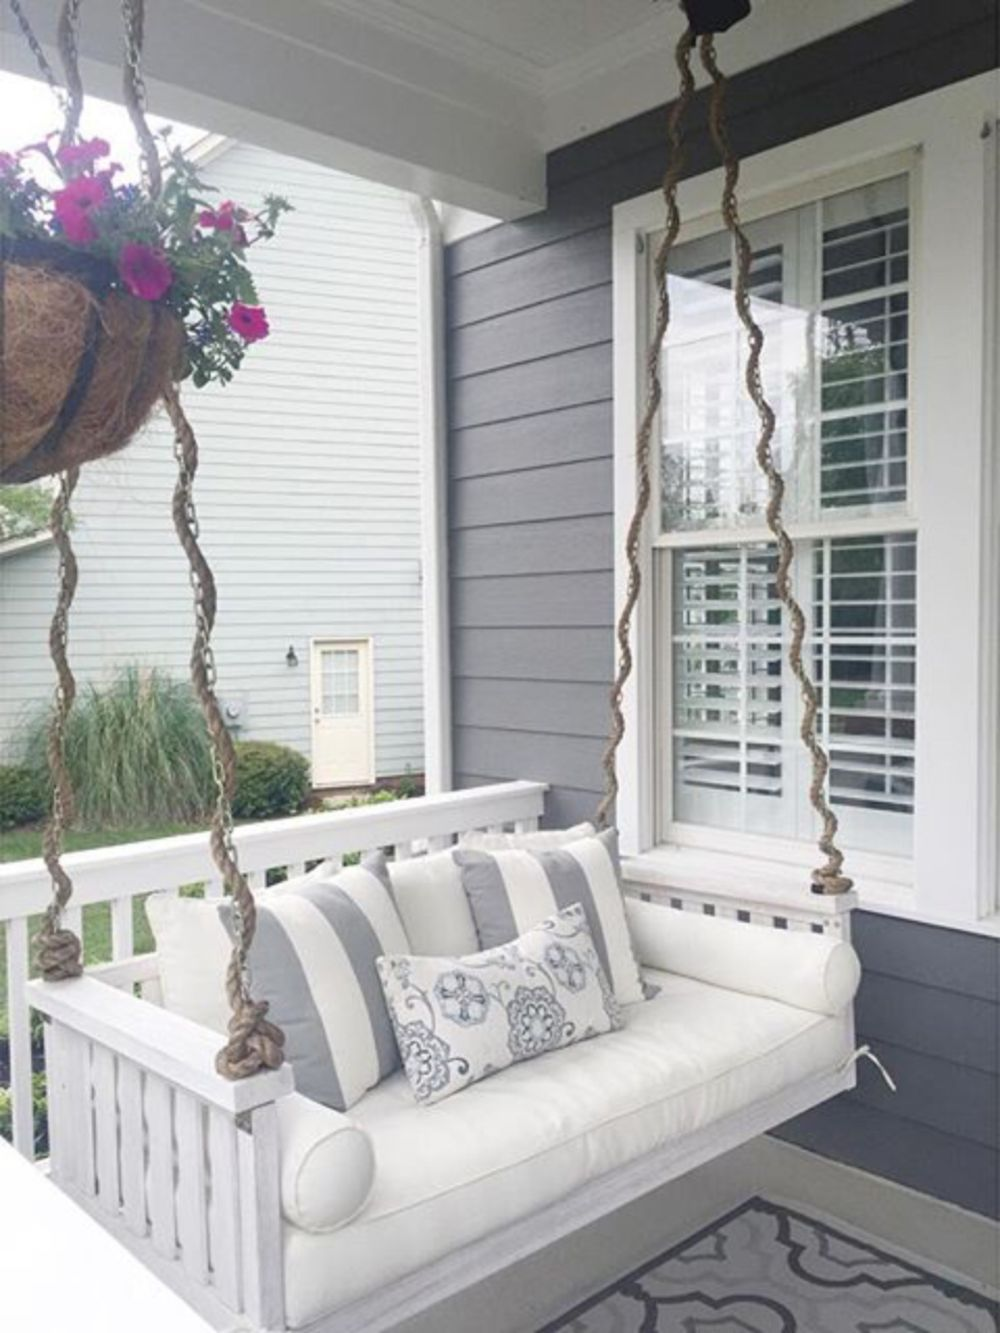 Pin by natalie evans on deckssunrooms pinterest porch front